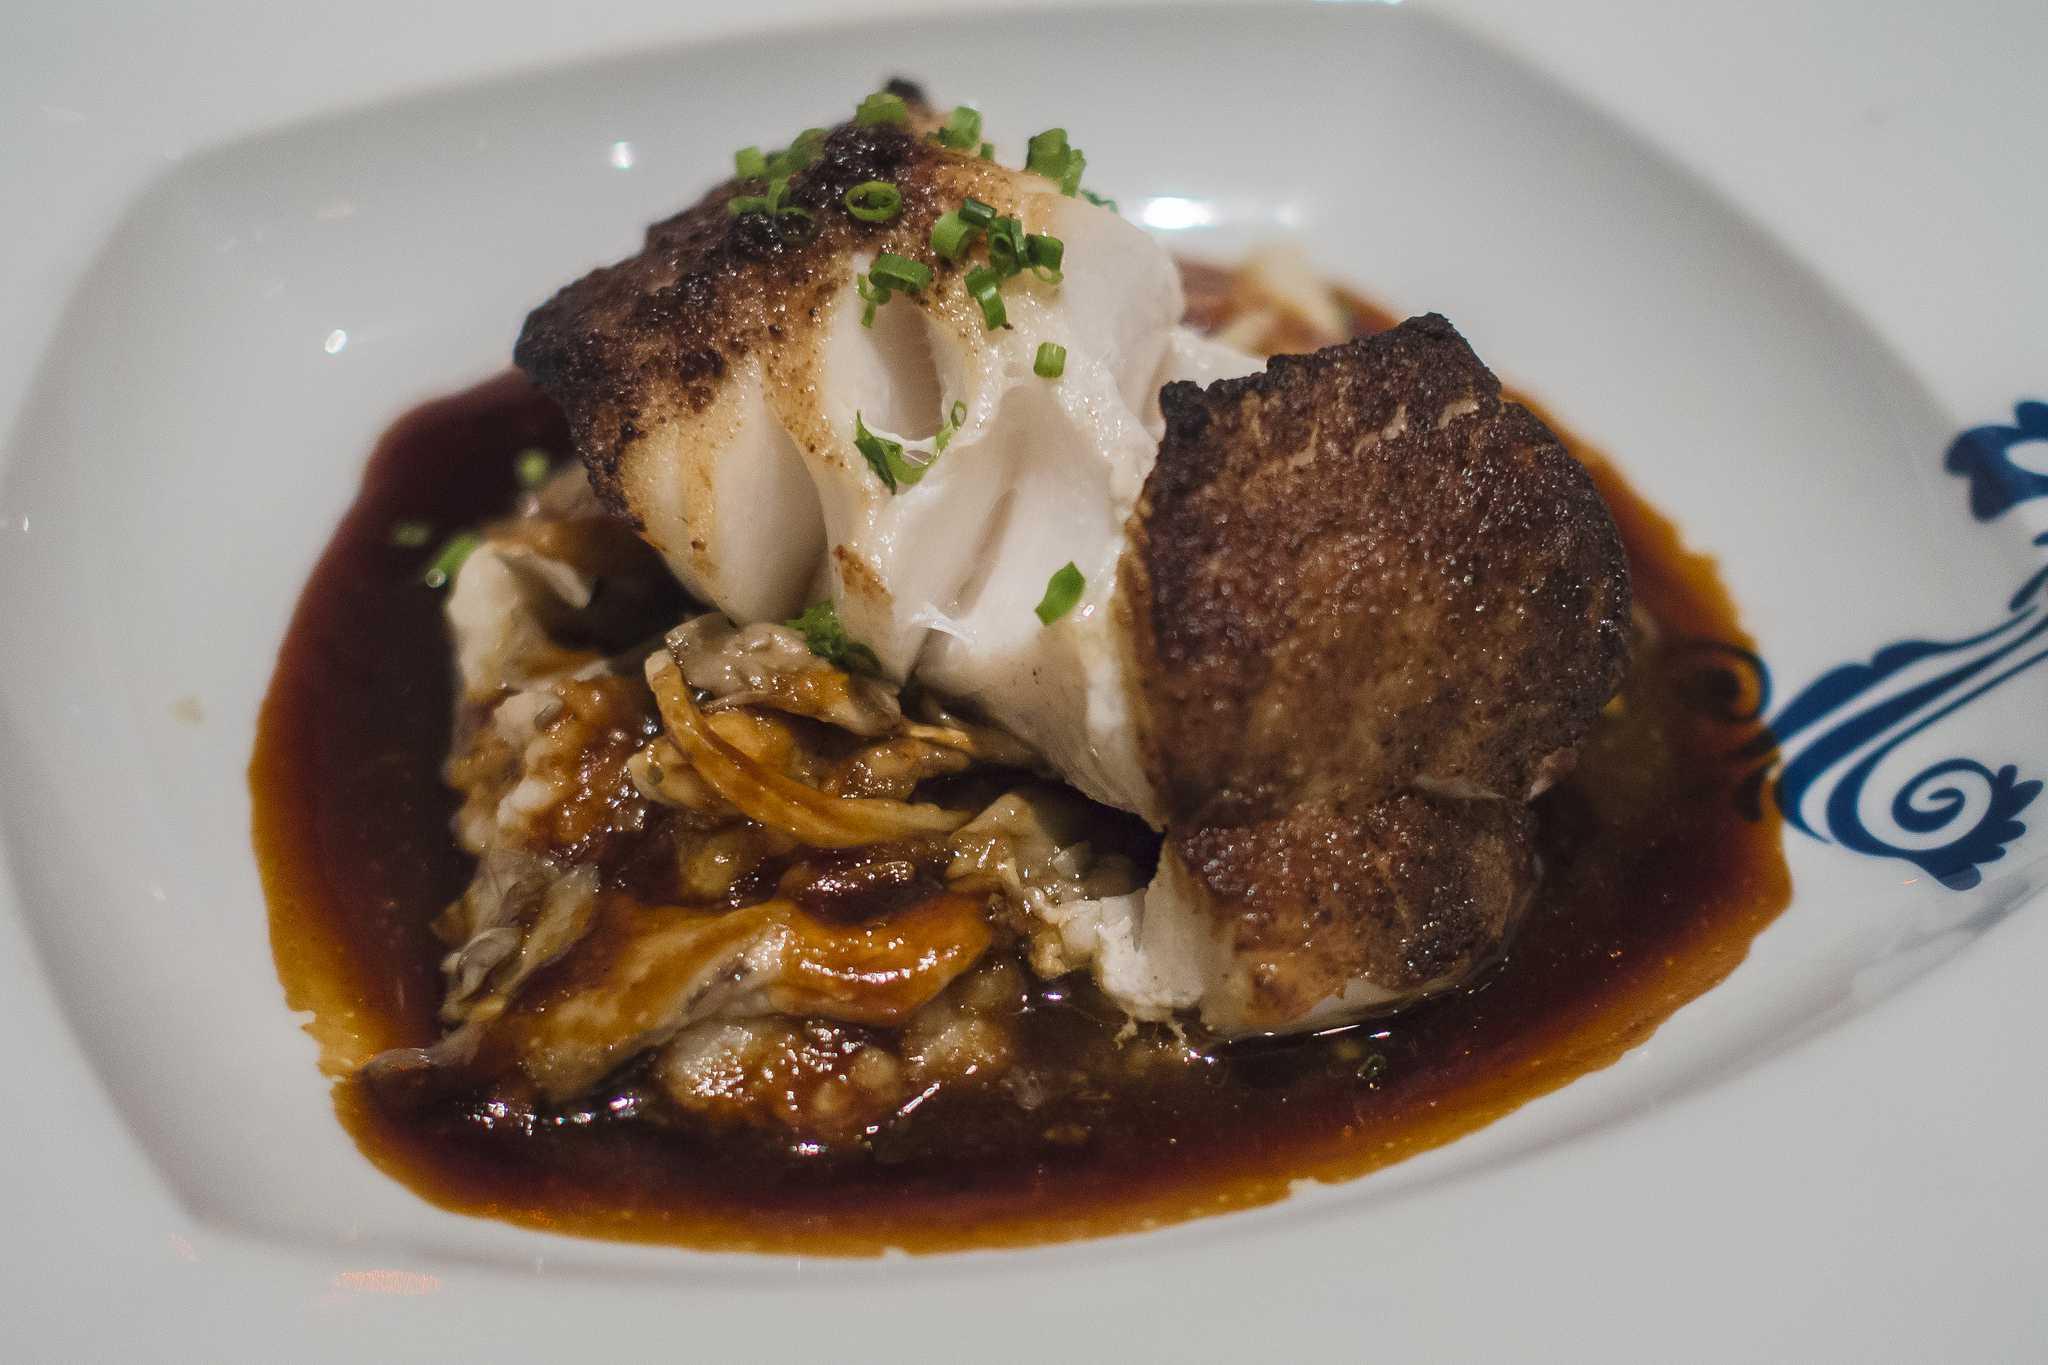 Porcini crusted roasted black cod, port reduction at Ferreira Café